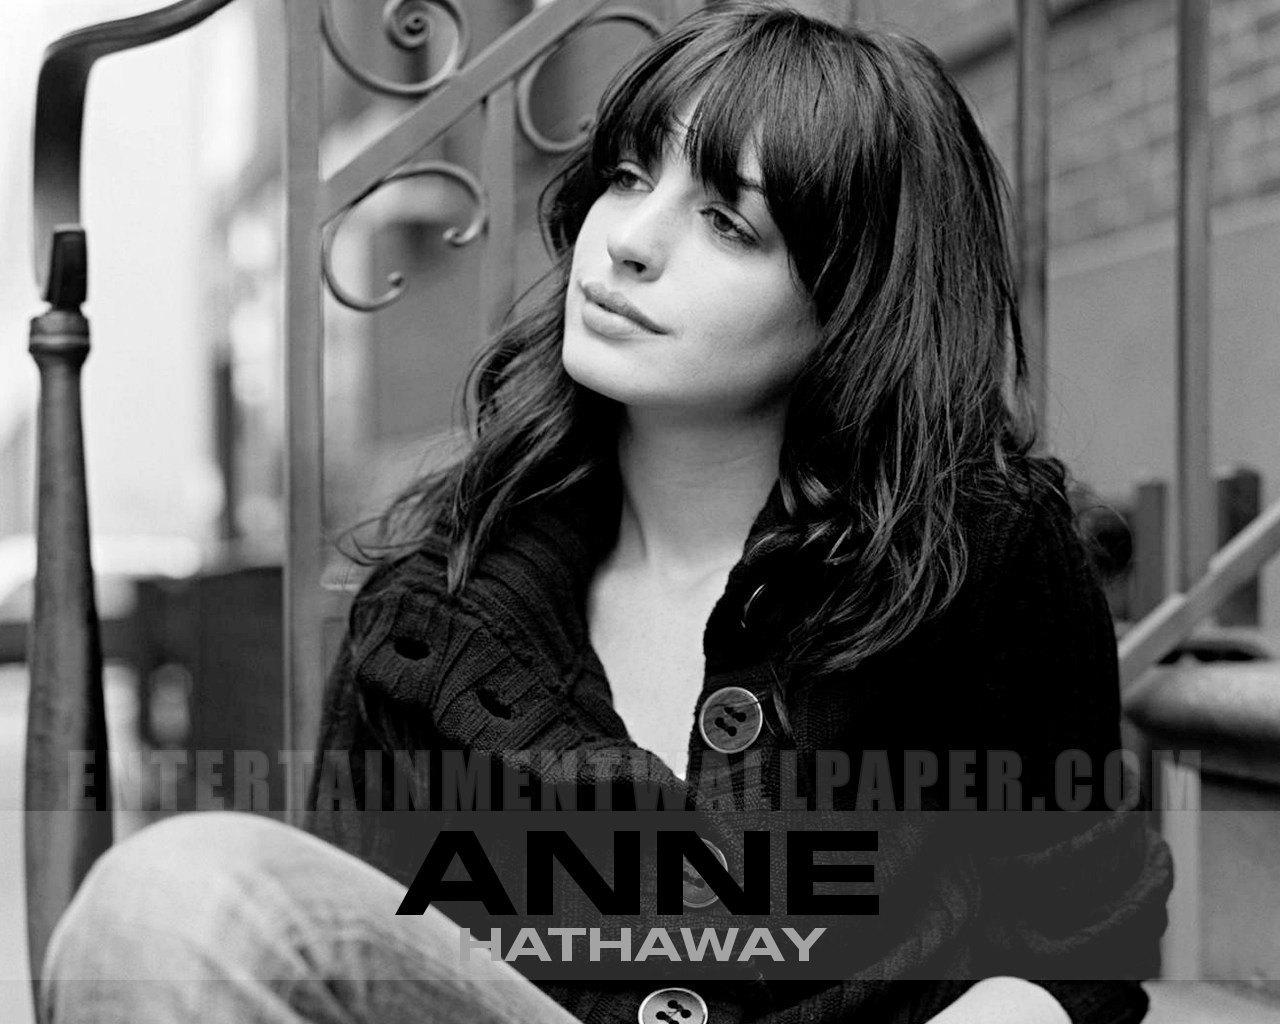 Anne Hathaway Picture - Anne Hathaway Picture